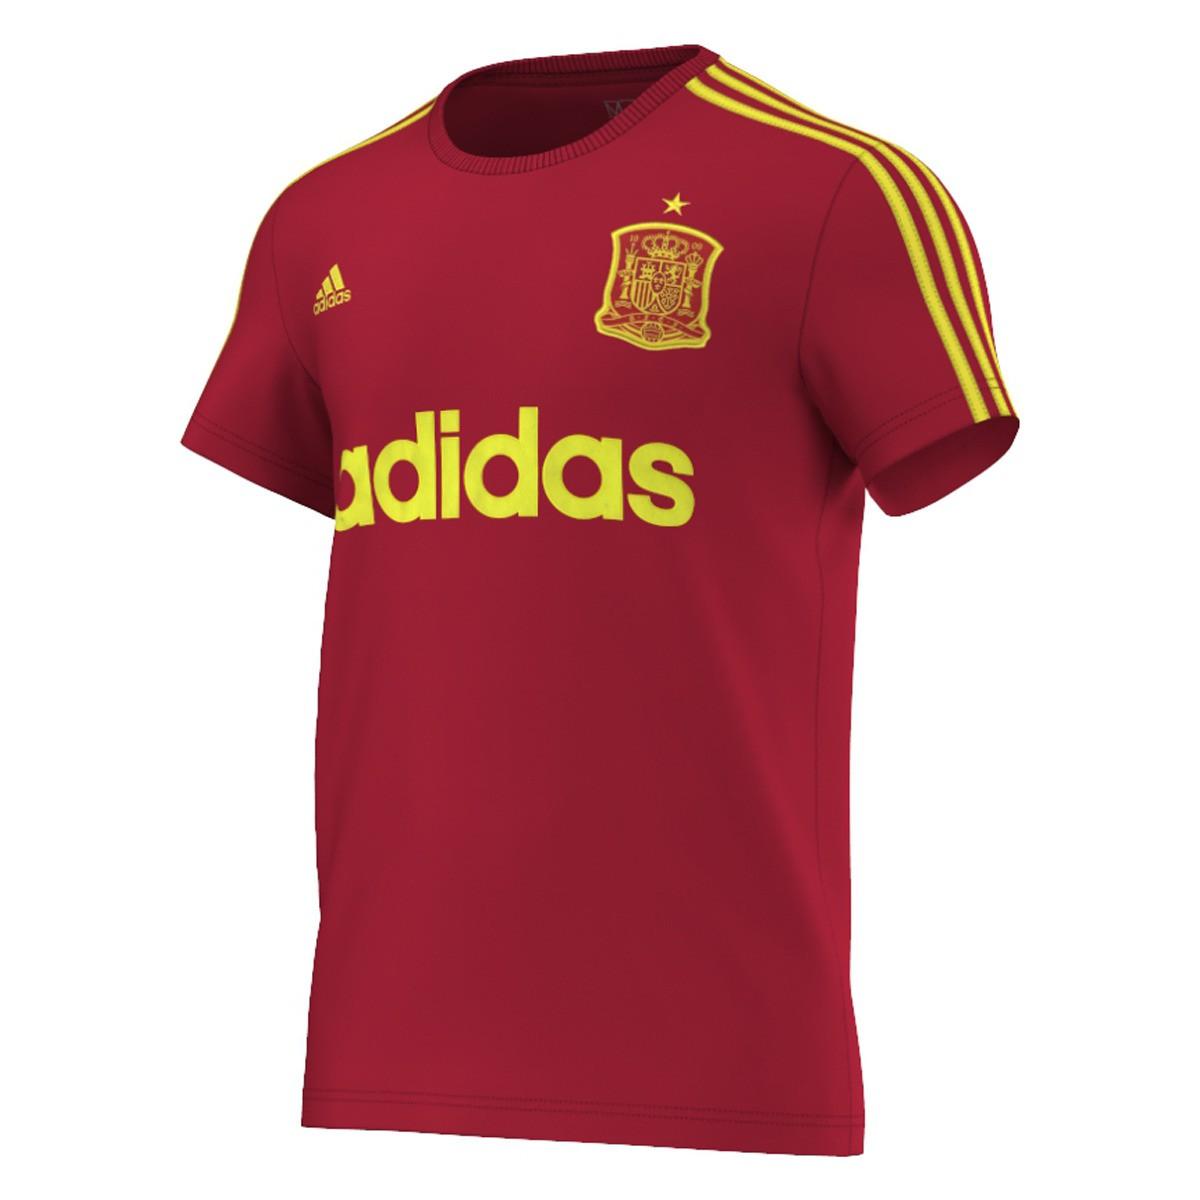 Exactitud petróleo crudo pasado  Camiseta Roja ADIDAS | barata camiseta roja | Roja camiseta Adidas | roja  Camiseta Adidas